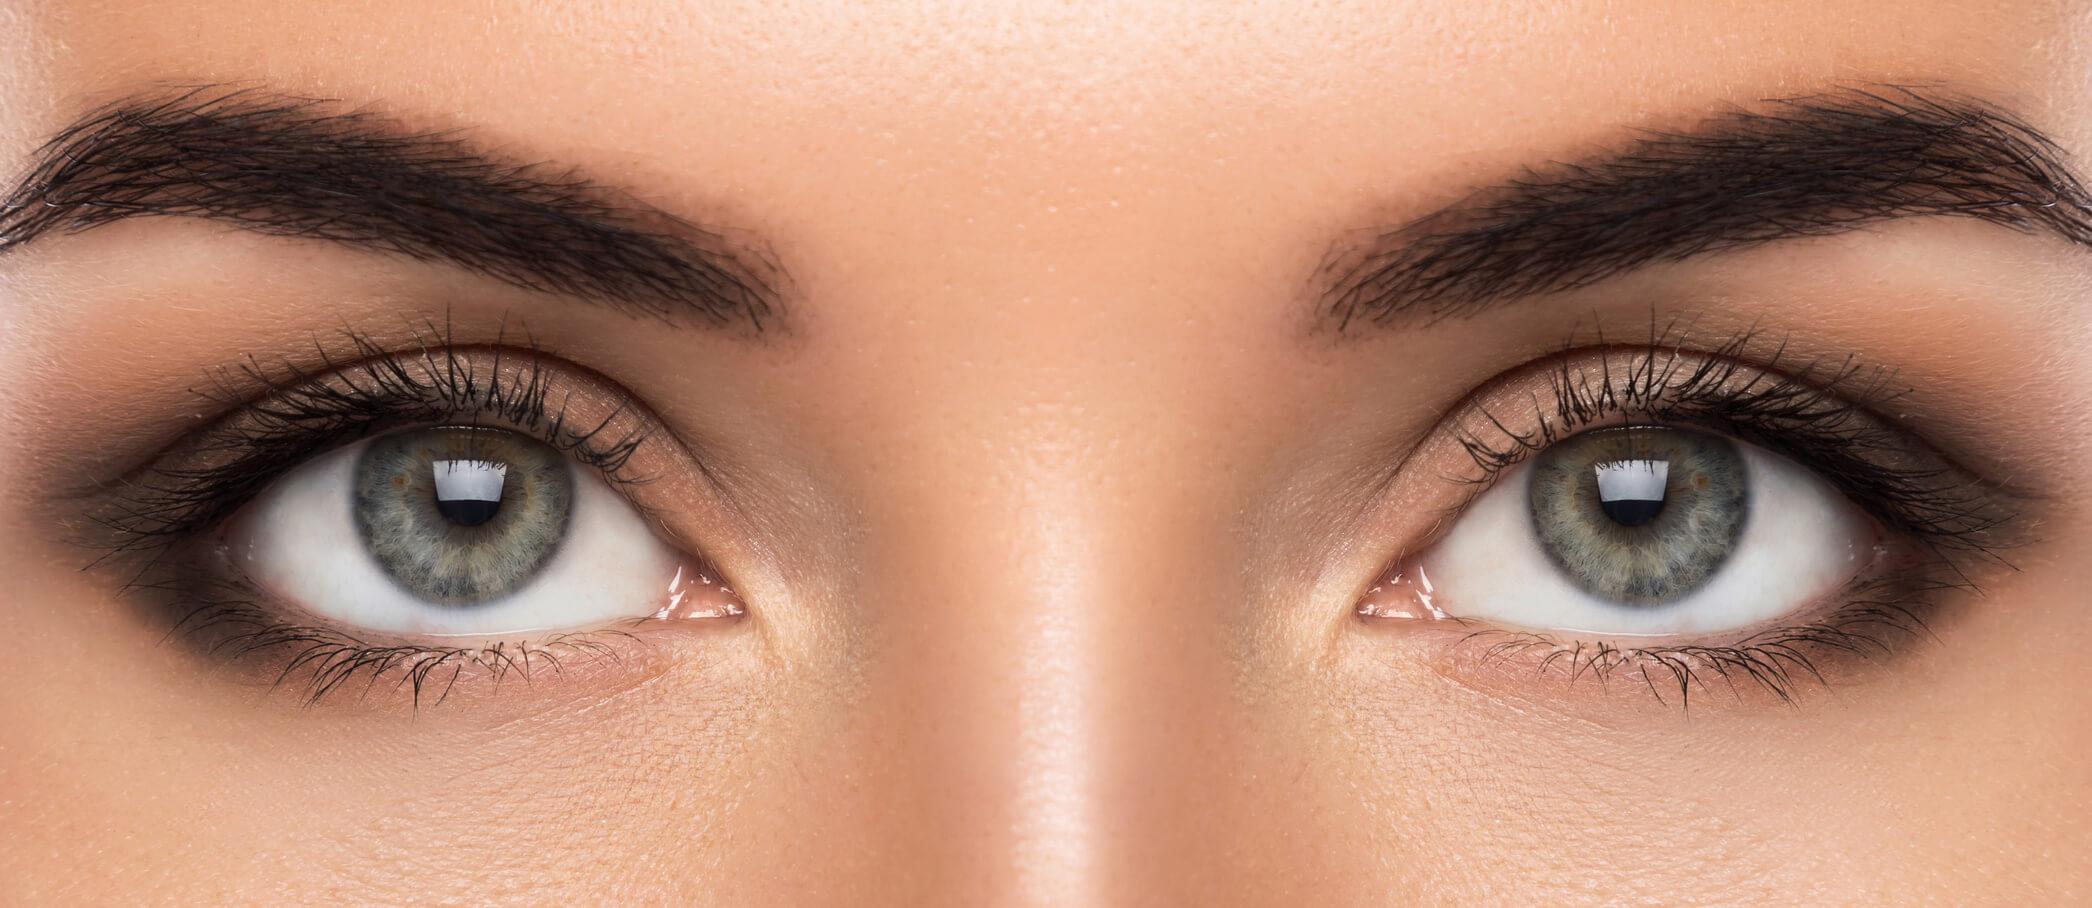 Nahaufnahme Augenpartie/ Microblading